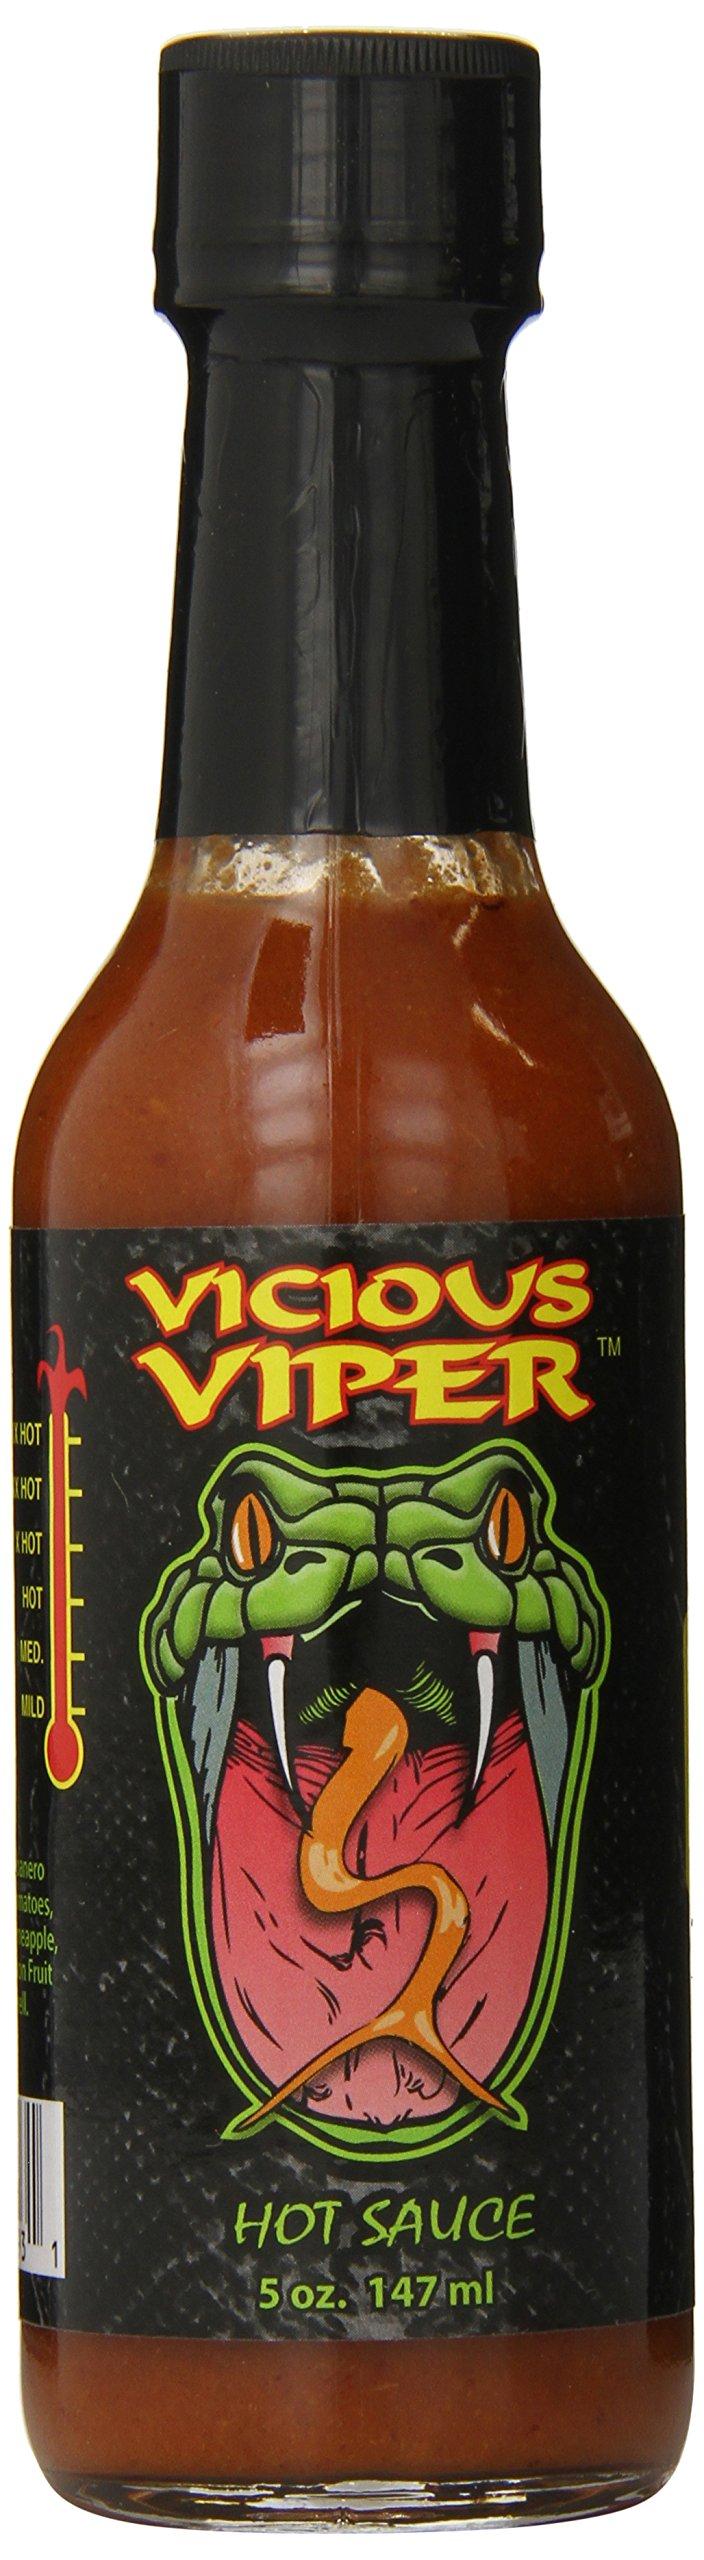 Vicious Viper Hot Sauce, 5 Ounce